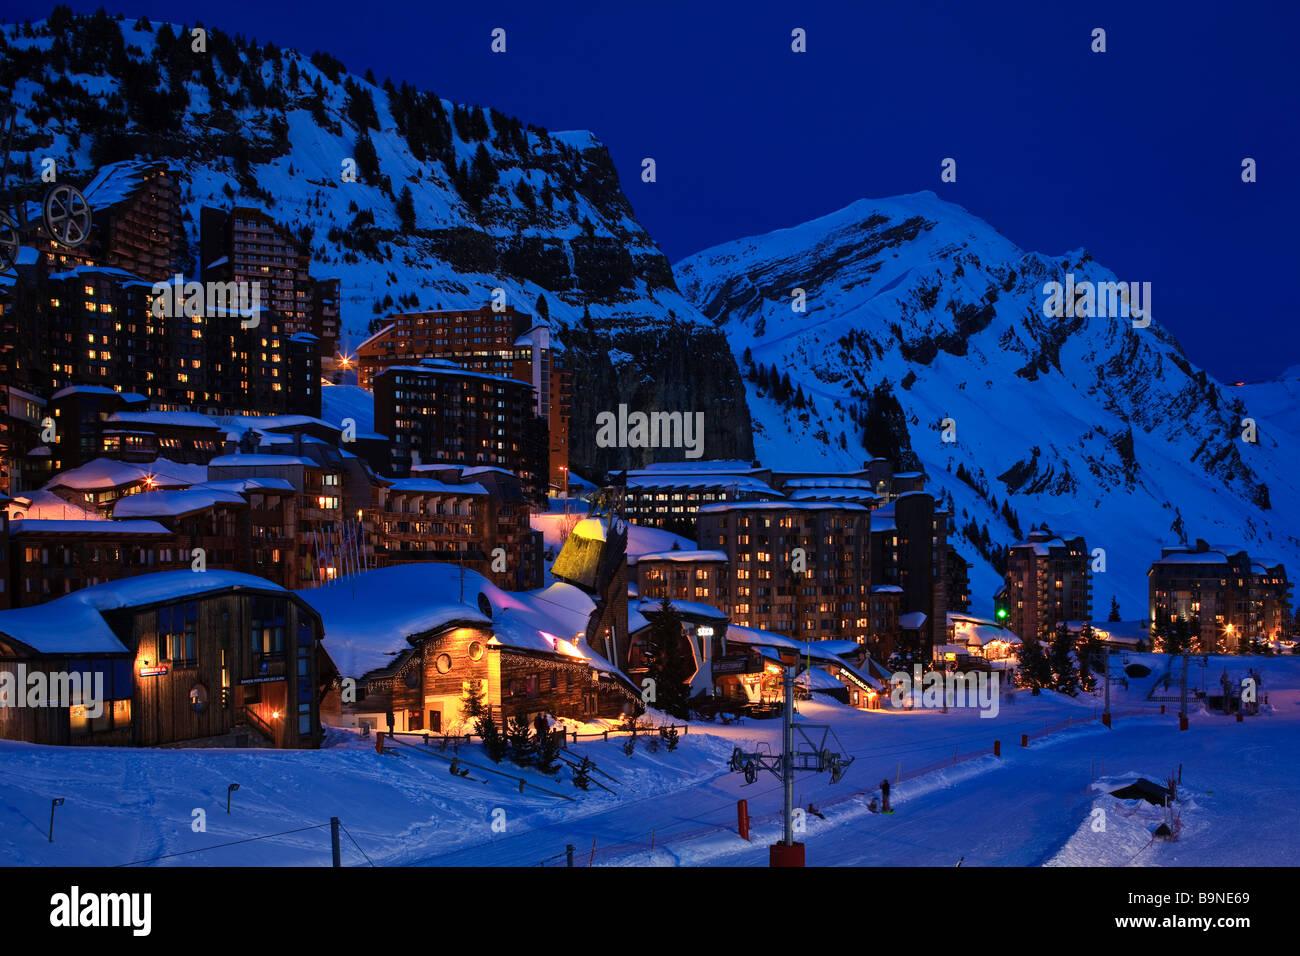 avoriaz ski resort stock photos & avoriaz ski resort stock images